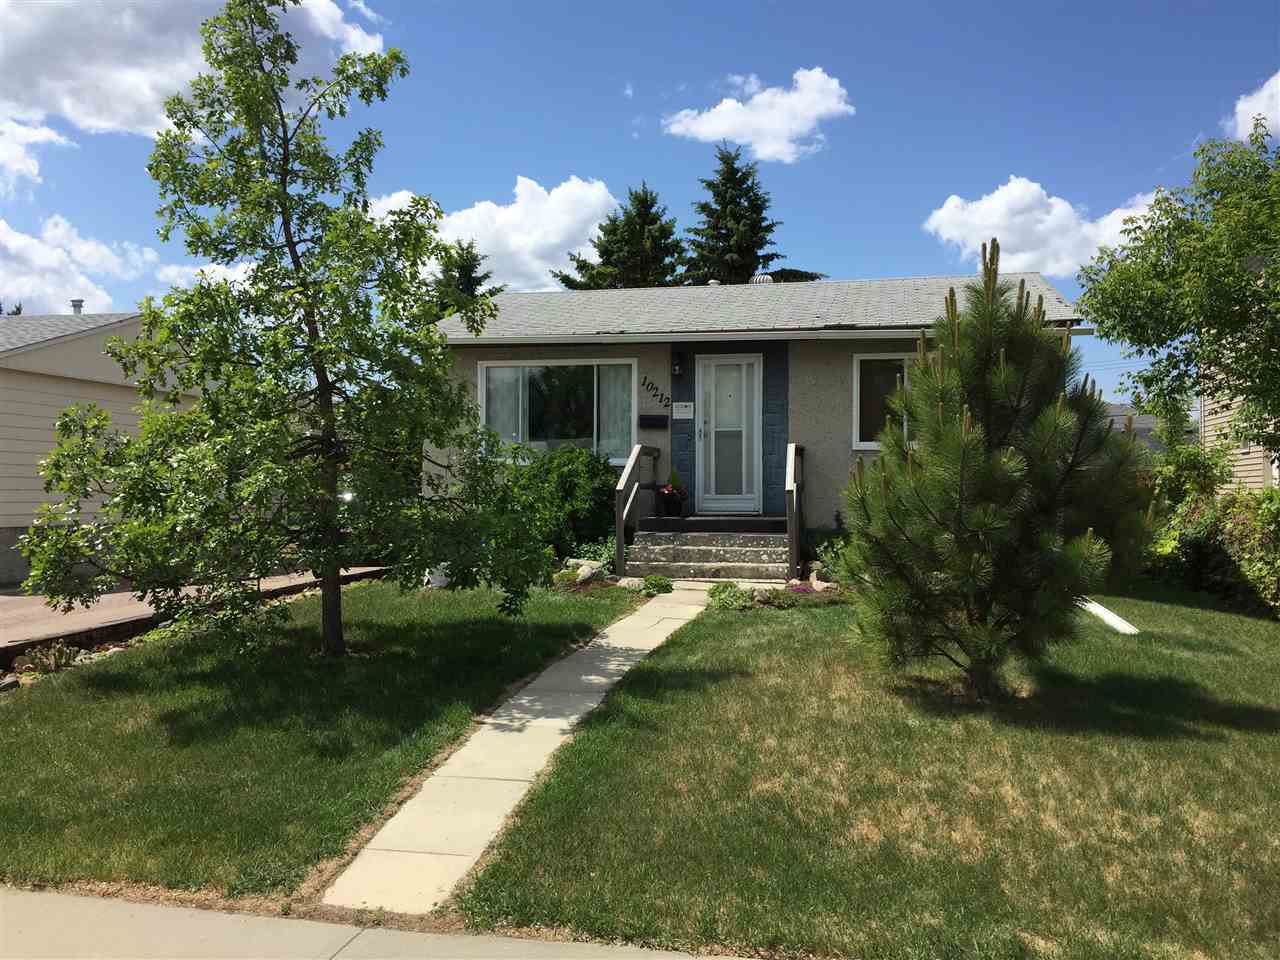 Main Photo: 10212 161 Street in Edmonton: Zone 21 House for sale : MLS®# E4134990